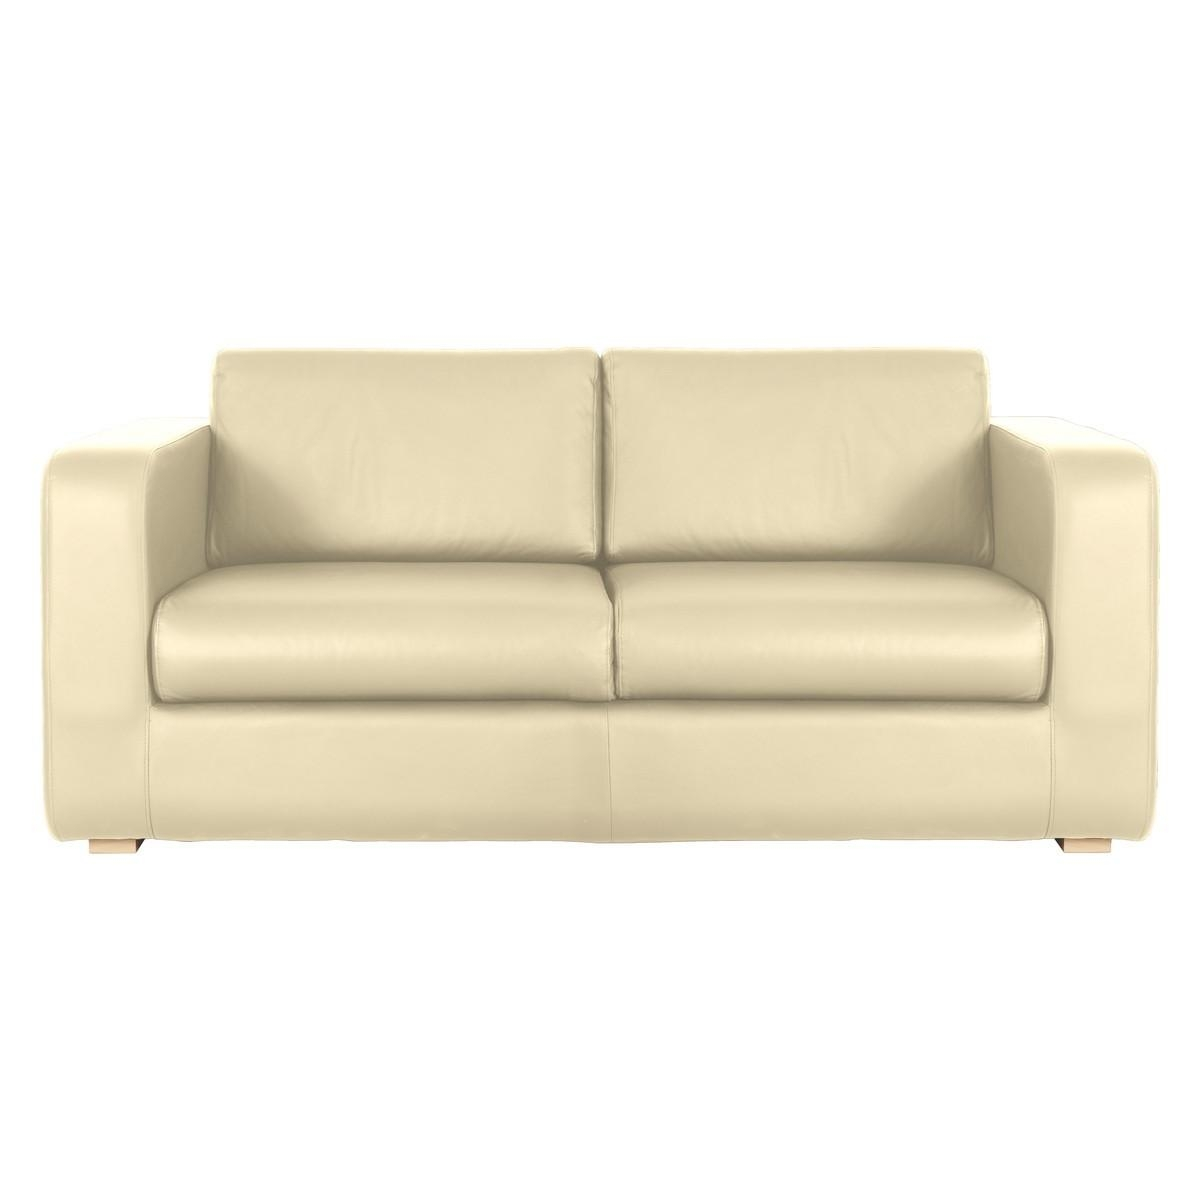 cream leather sofa set uk sater cover 20 best ideas three seater sofas